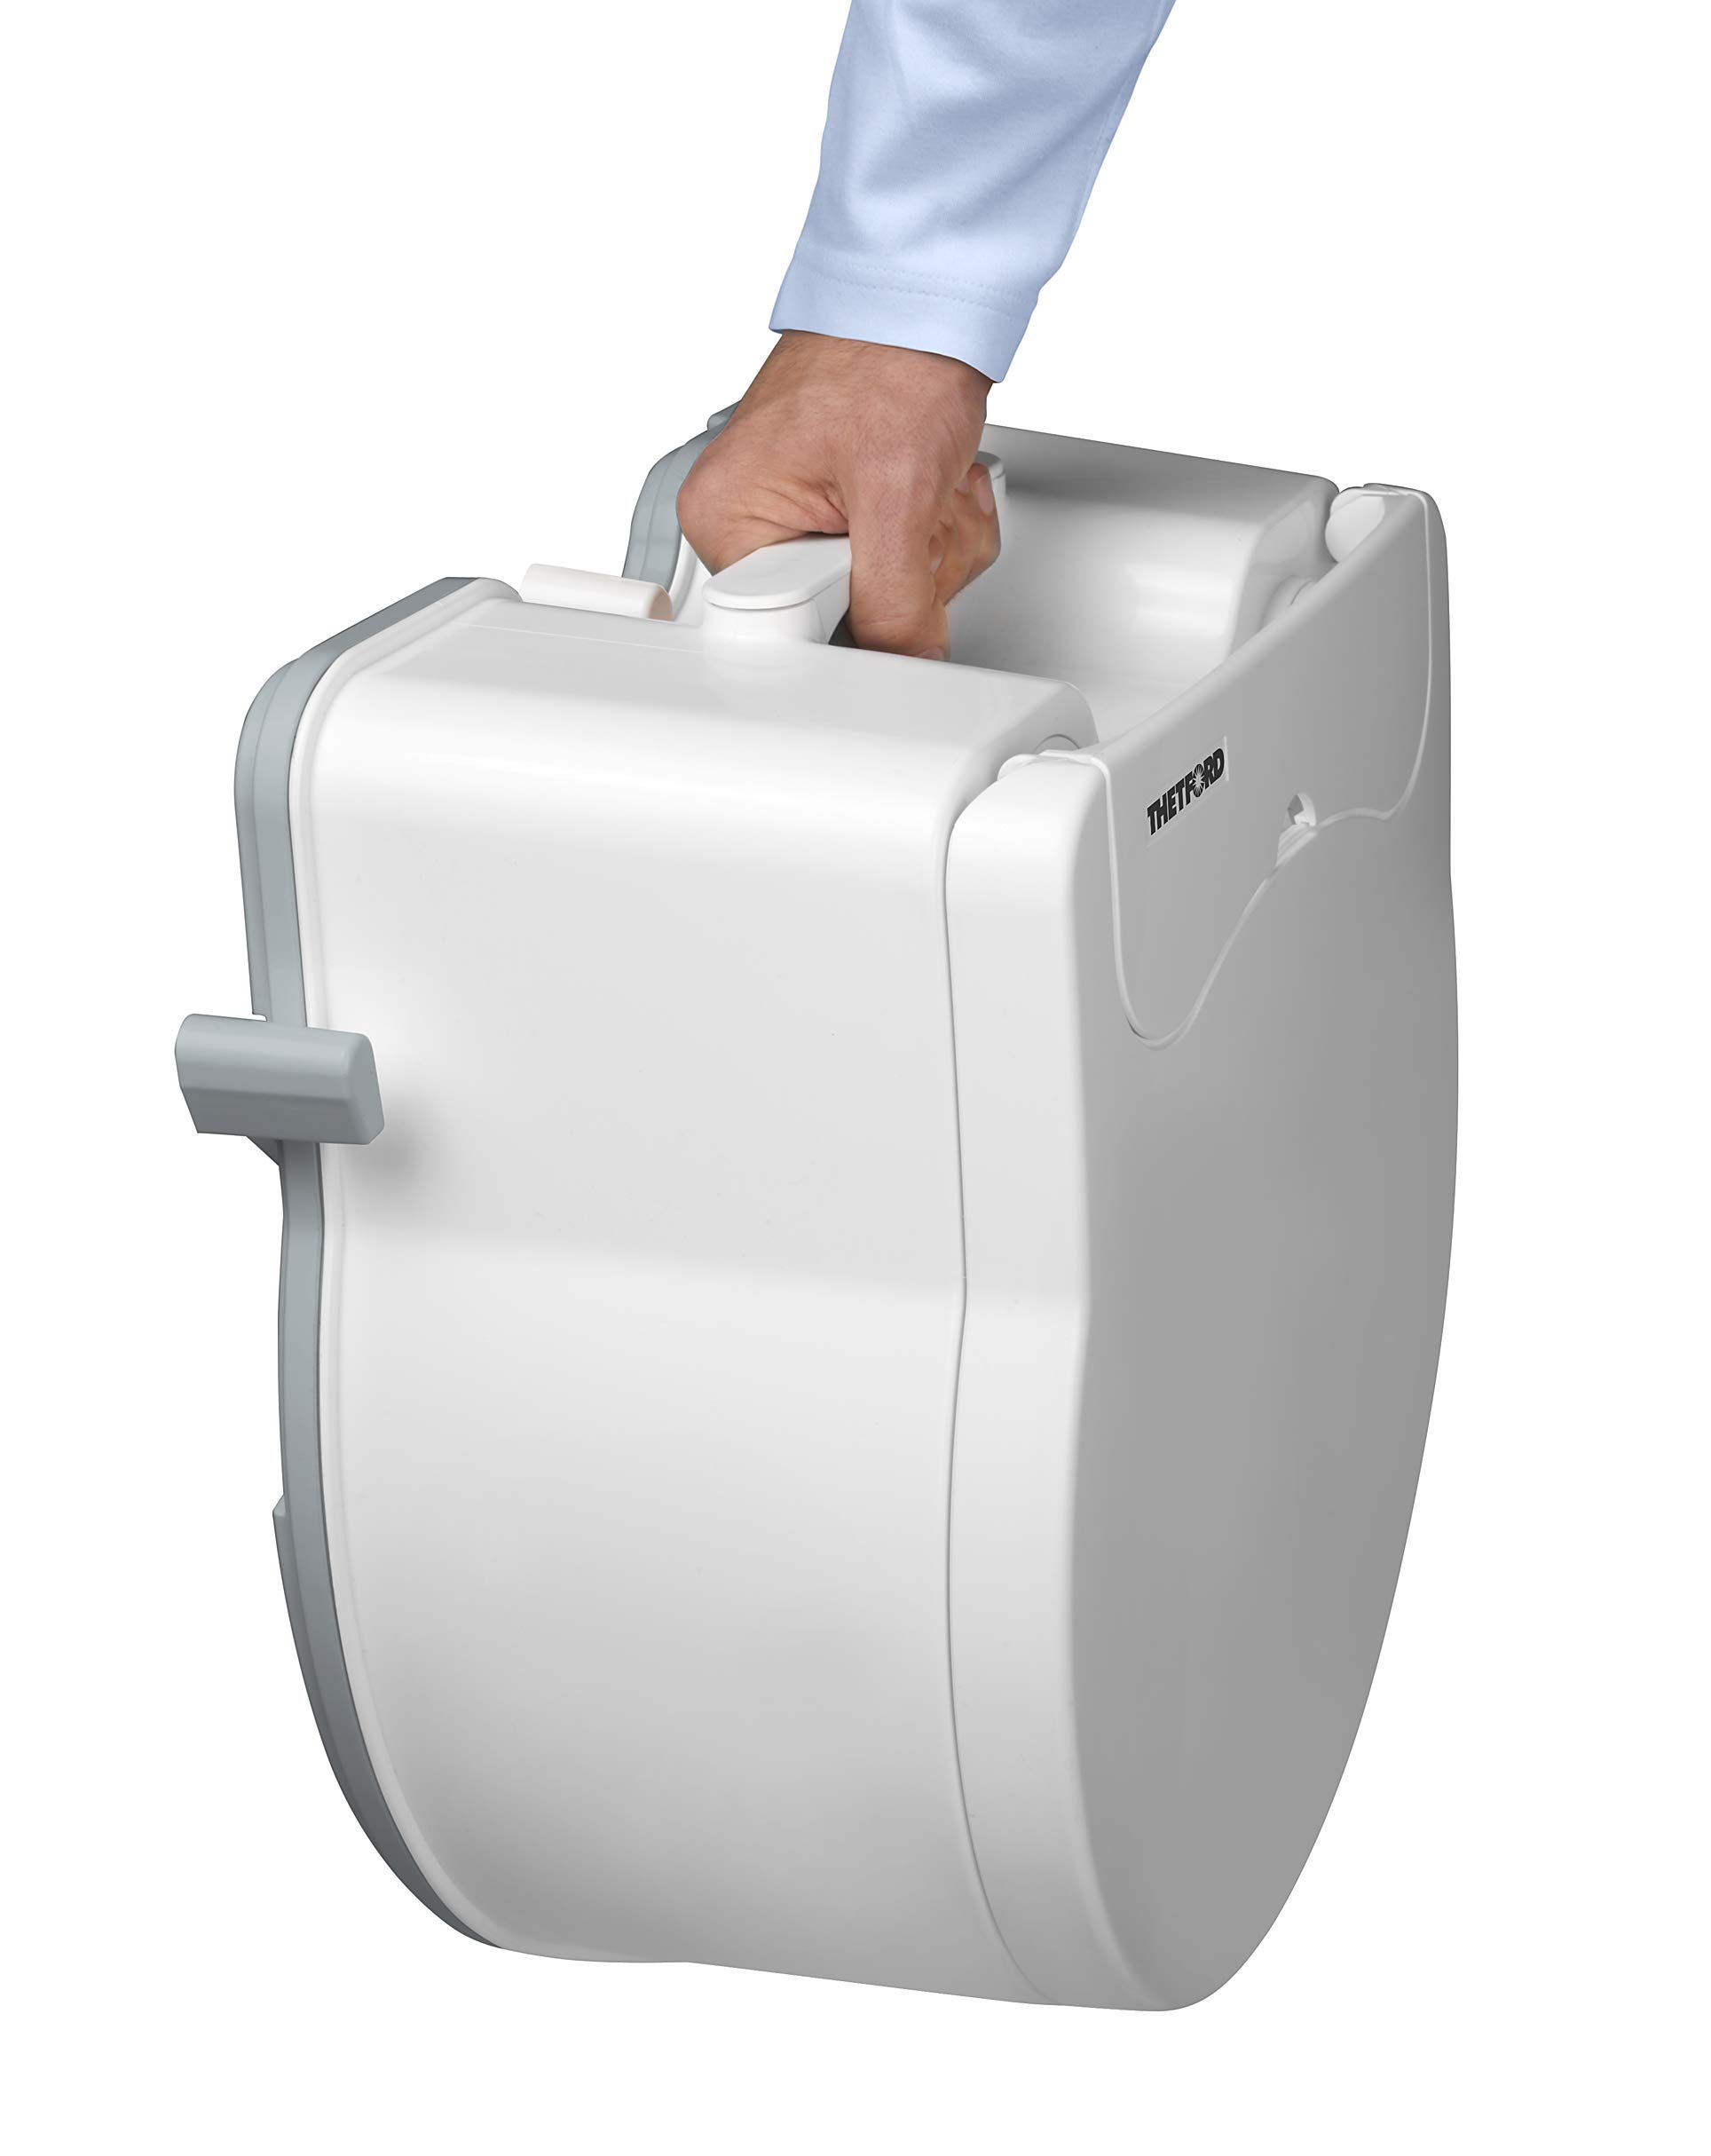 Thetford 92305 Porta Potti 565P Excellence Portable Toilet (Manual), 448 x 388 x 450 mm 13